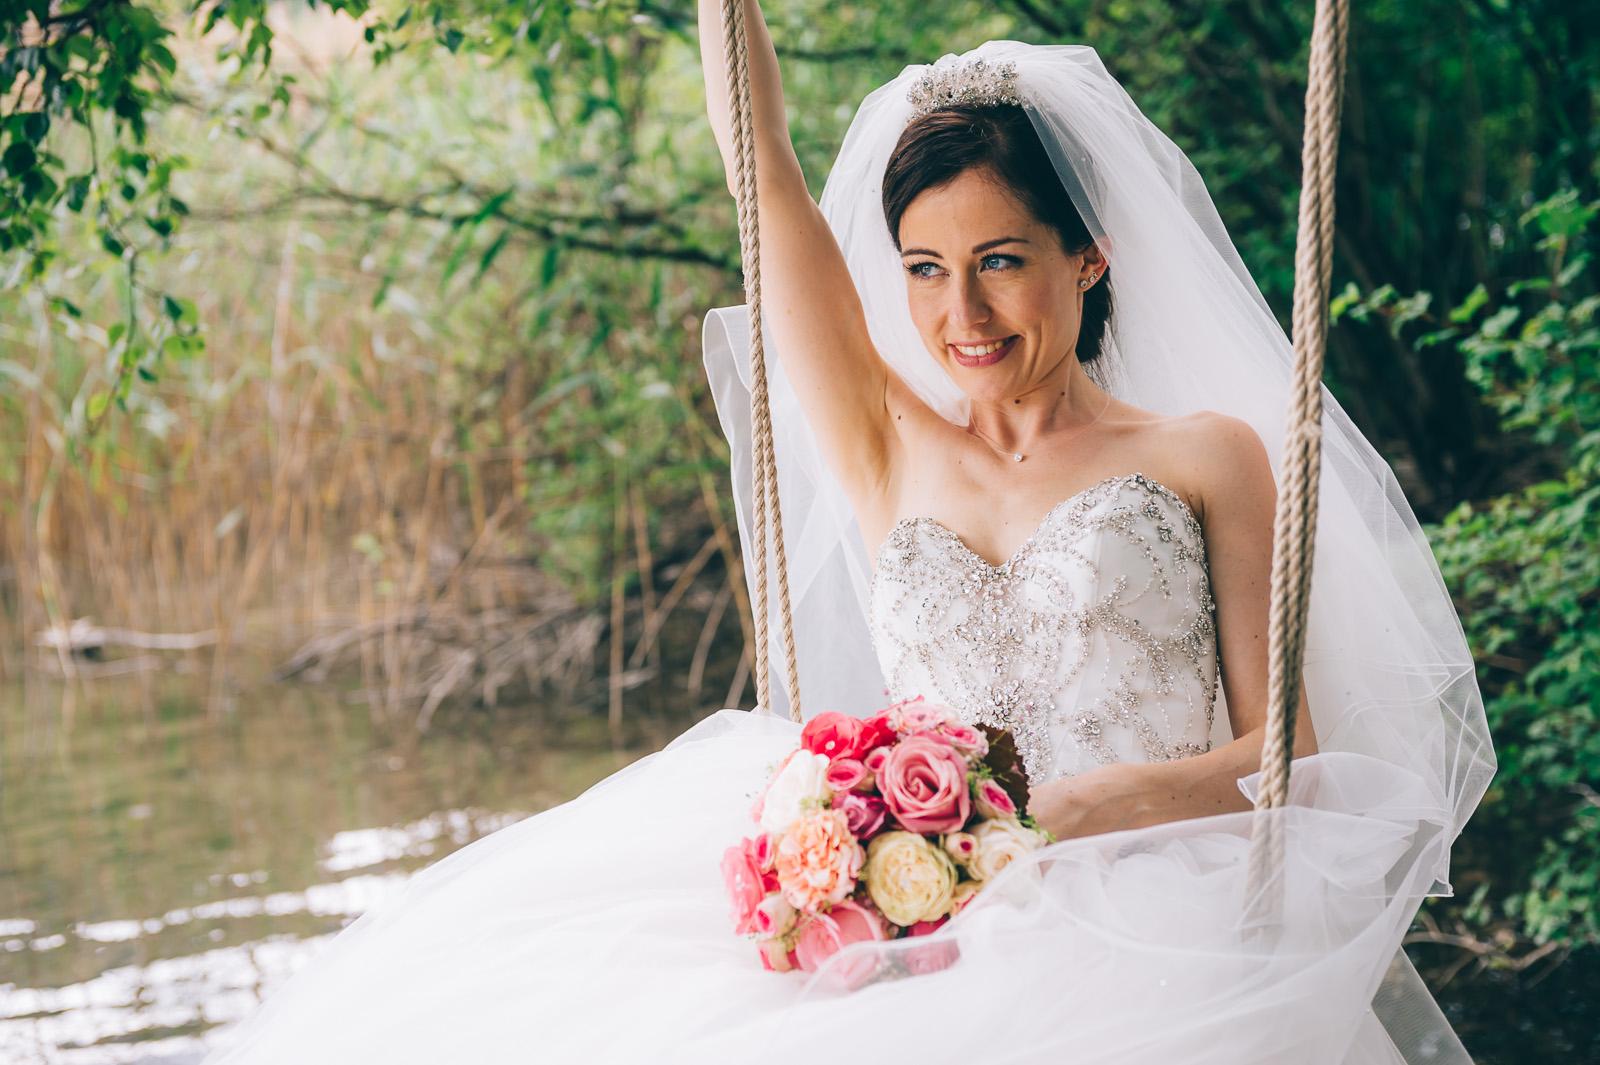 Braut Janette - Styling by Wandelbar Make-Up und Erhan Dogru